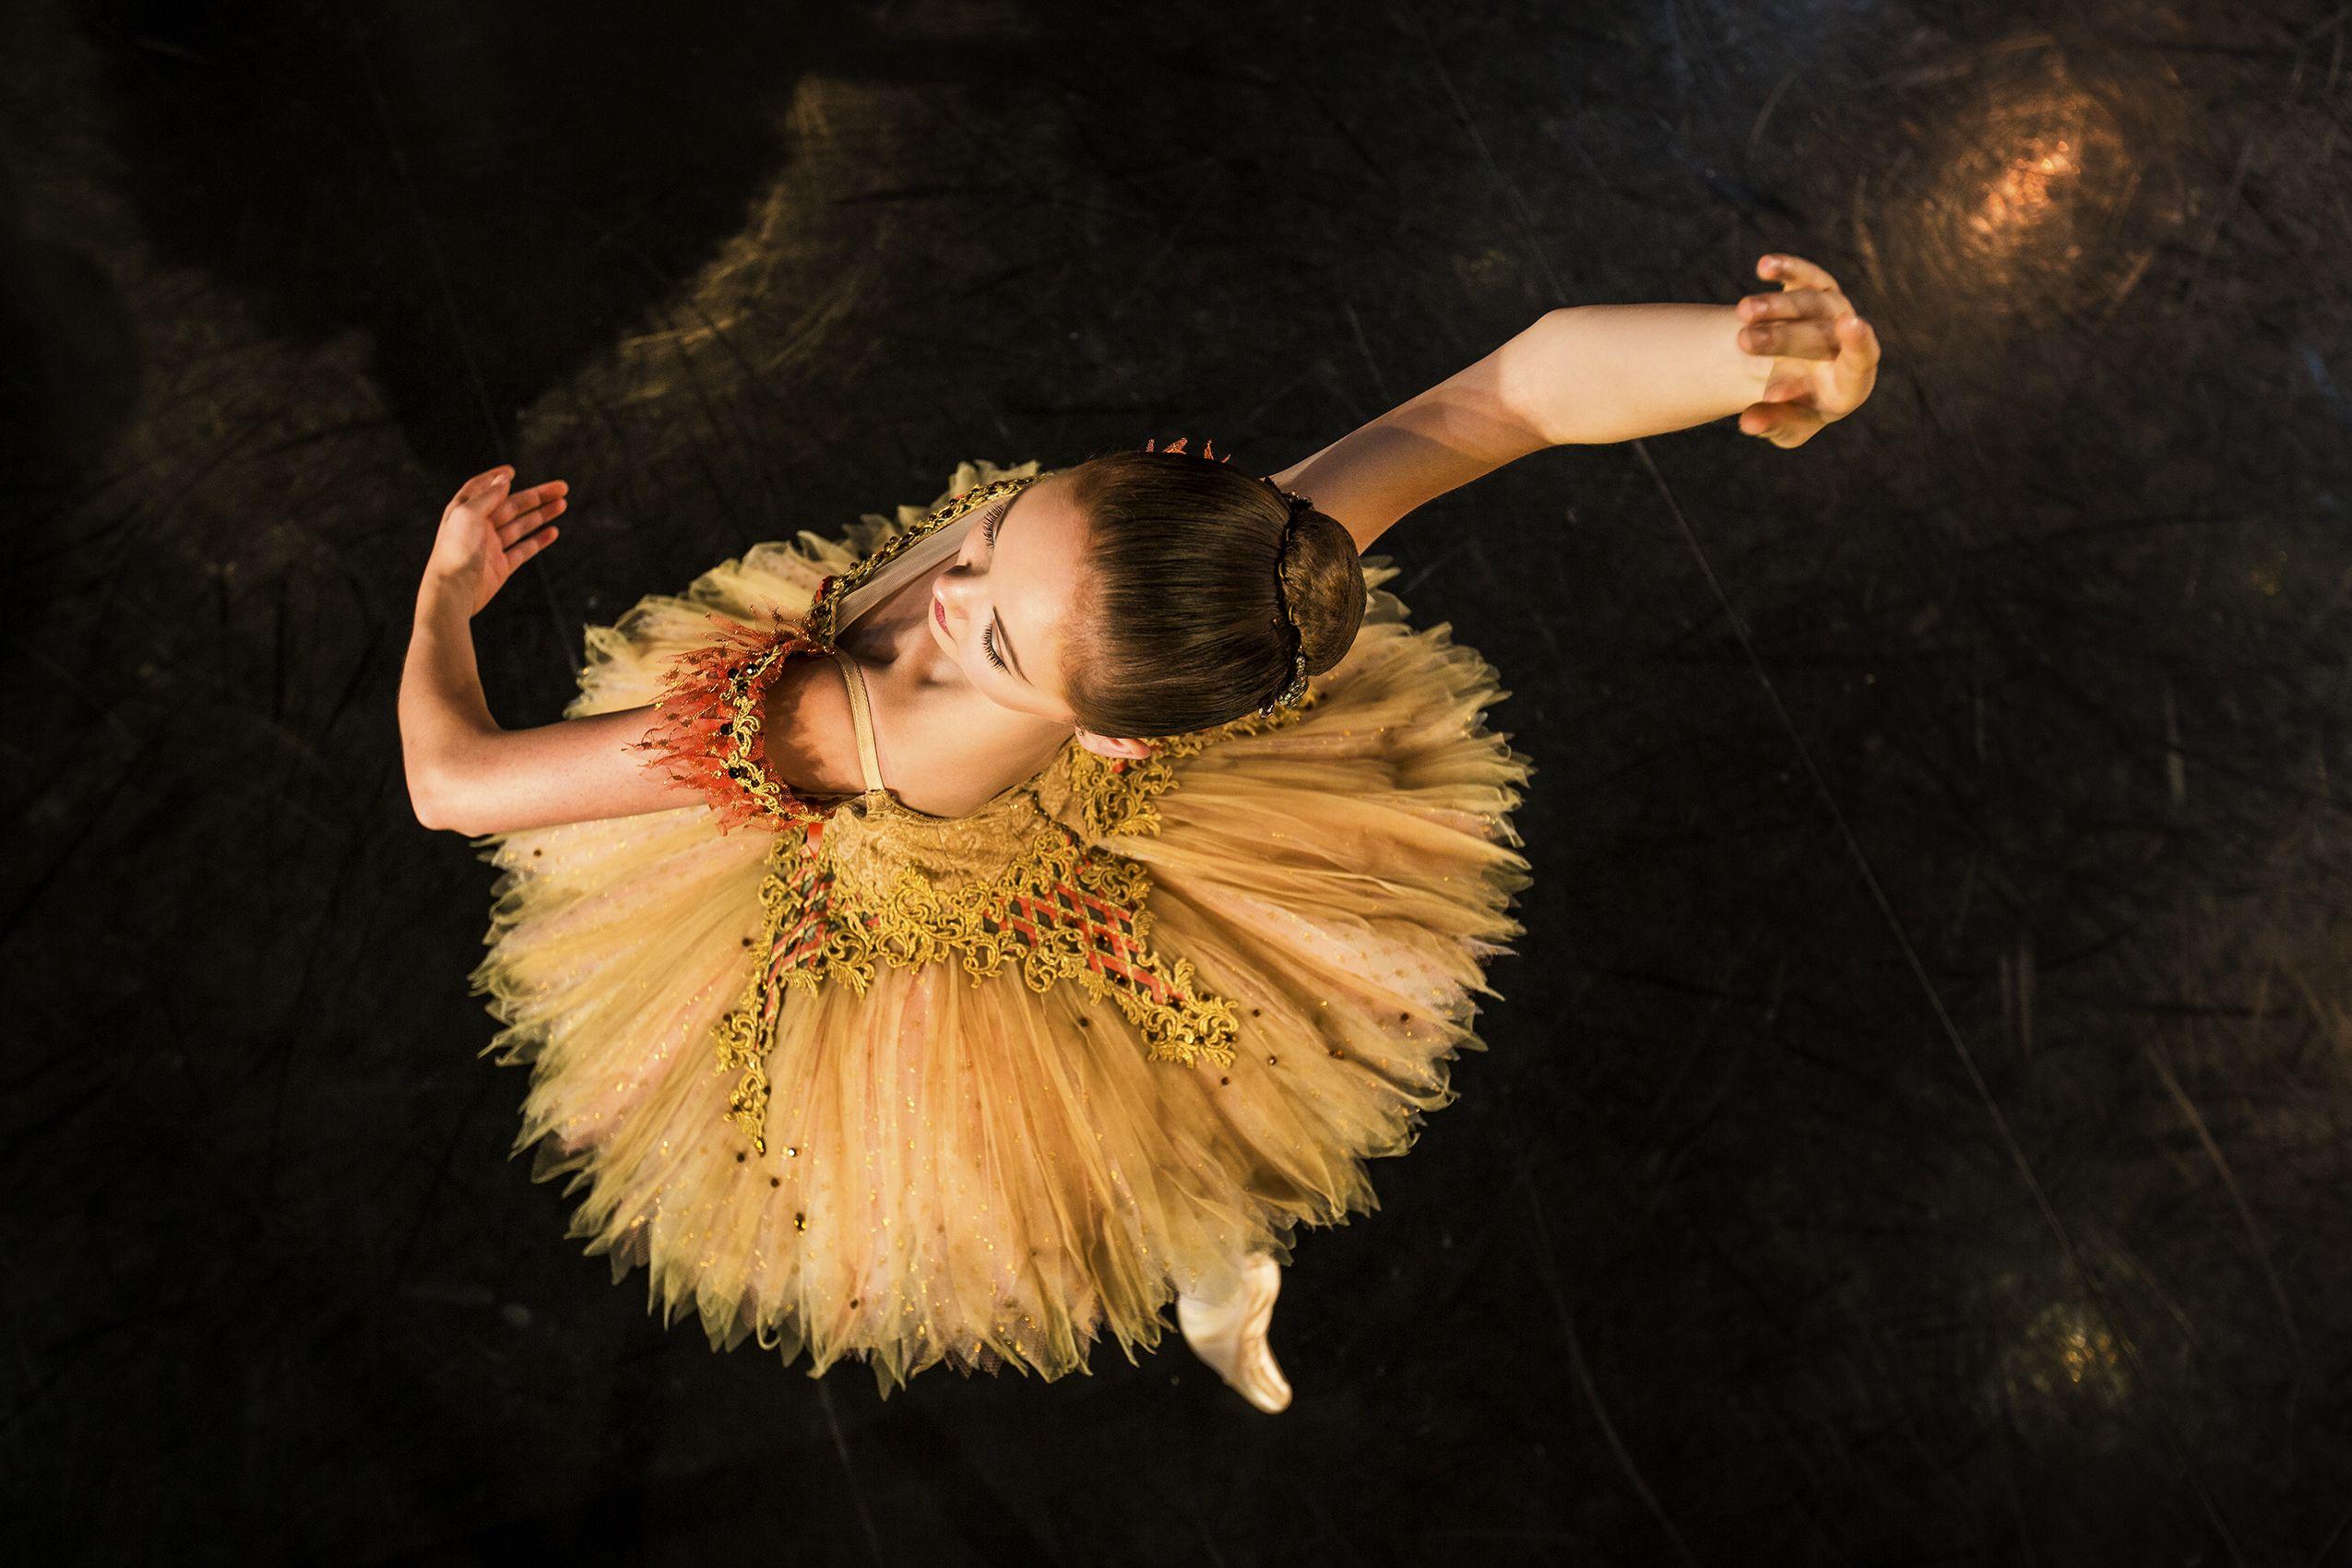 Paquita Royal Winnipeg Ballet School Photo Courtesy Of Stanislav Balyaevsky And The Schools Professional Division Students